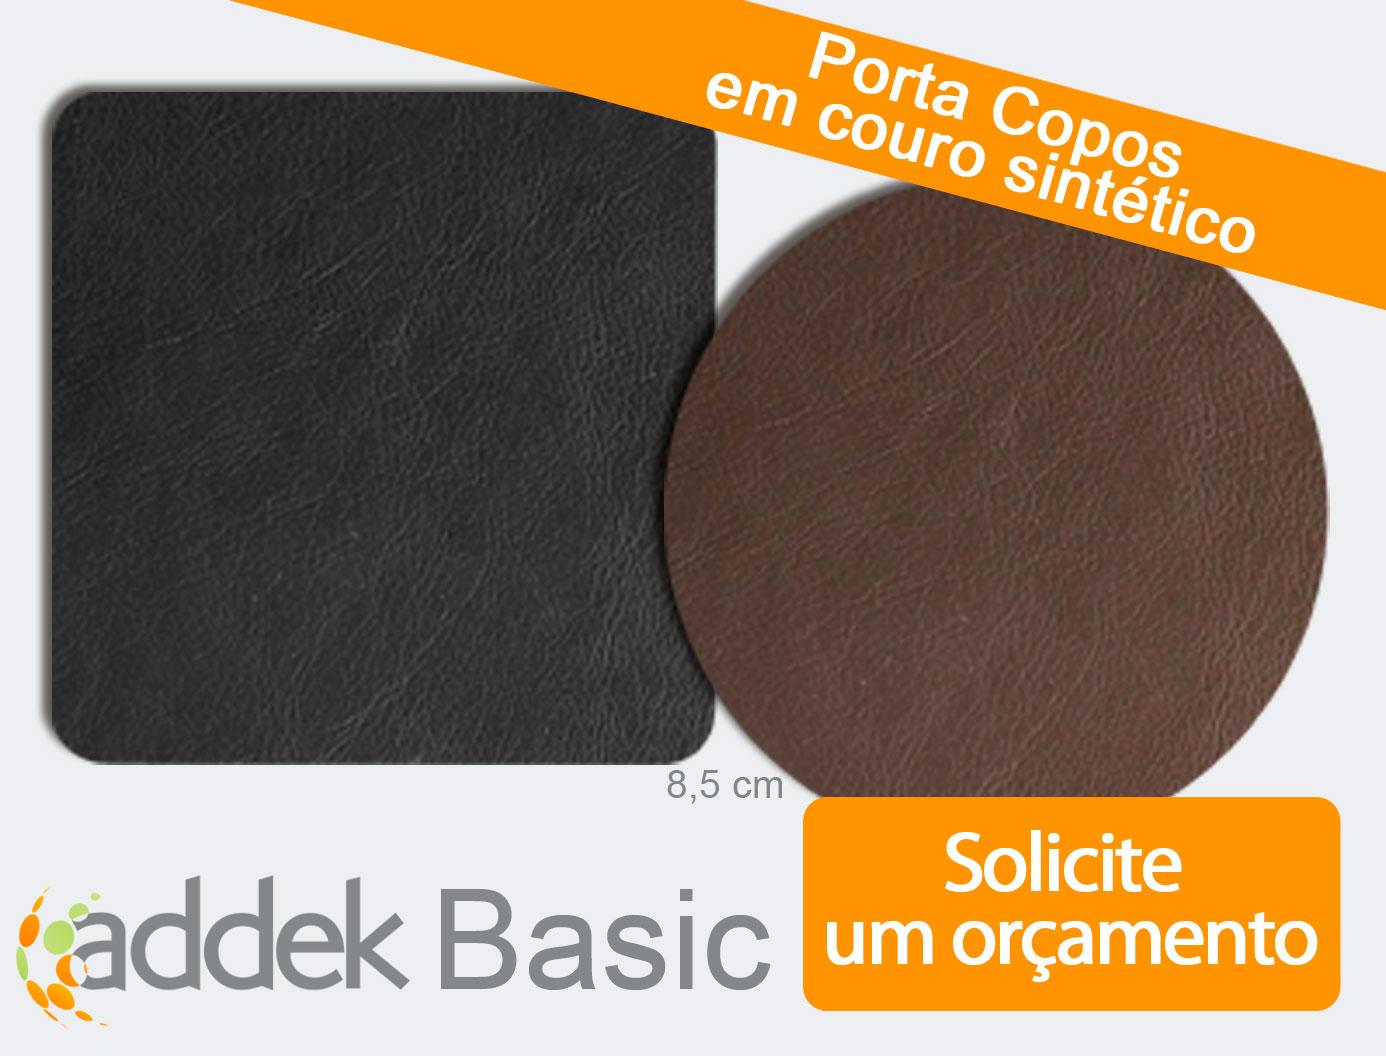 Addek-Basic-Porta-Copo-orçamento